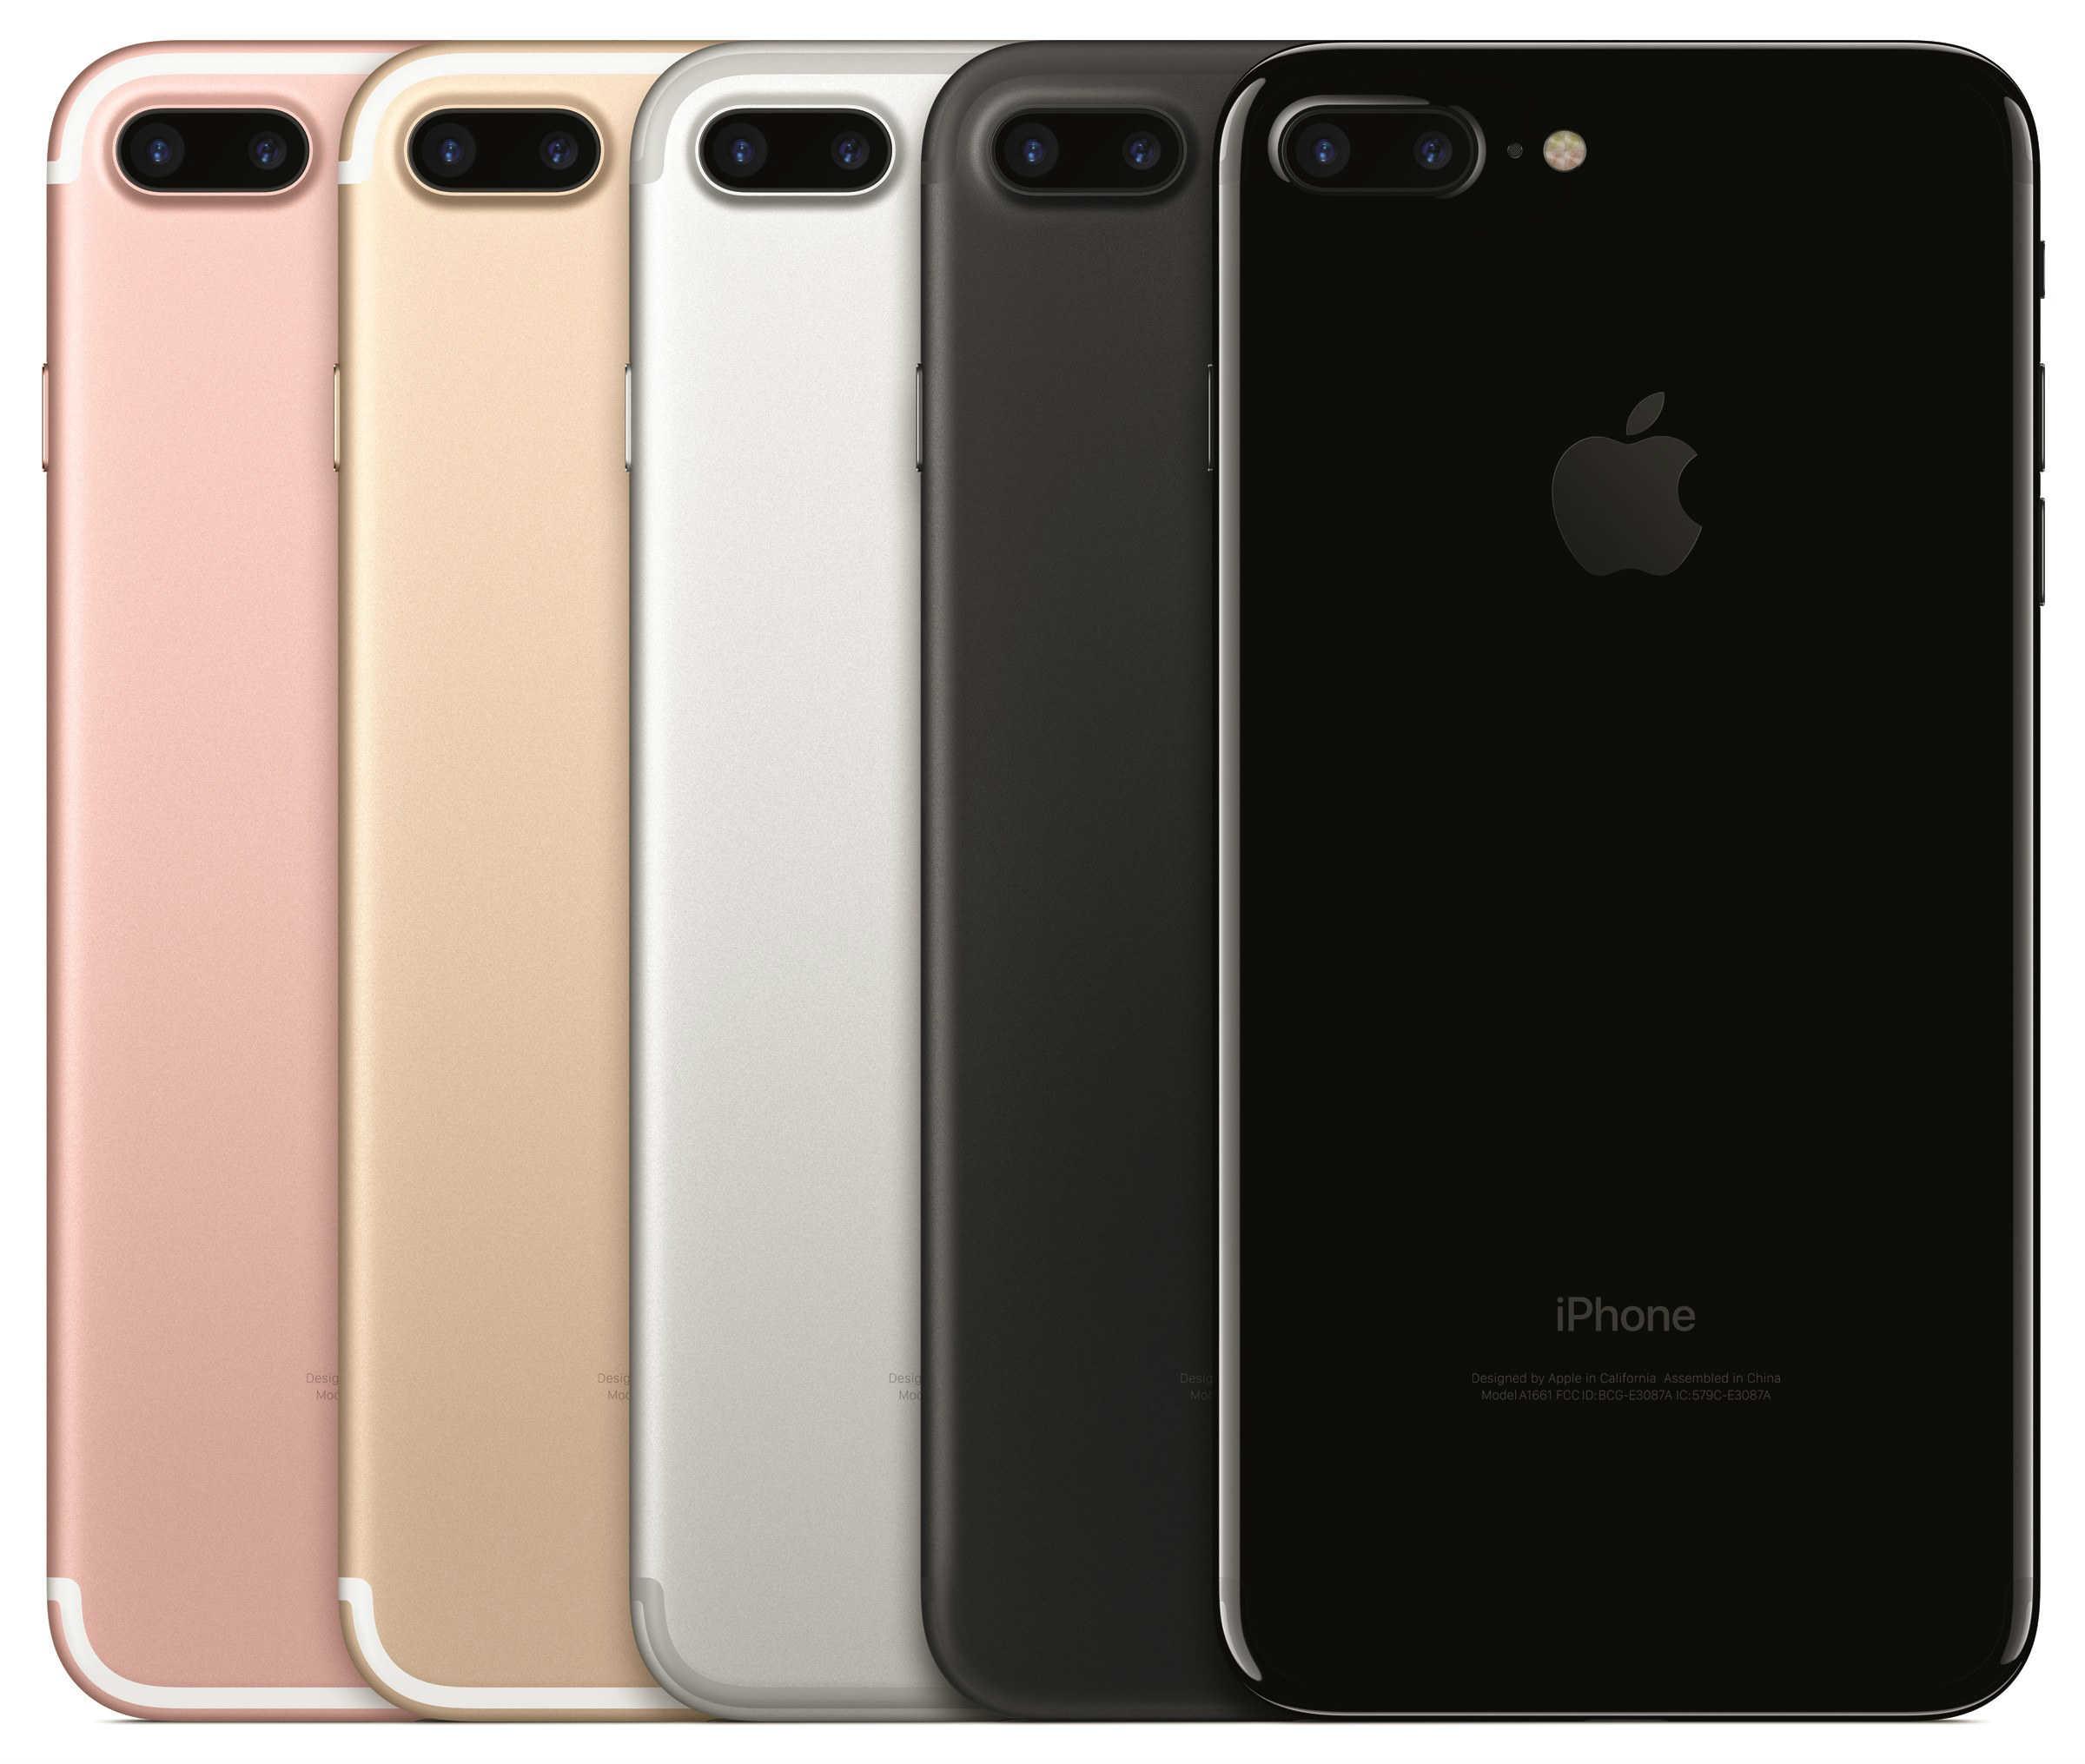 iphone-7-plus-lineup-1